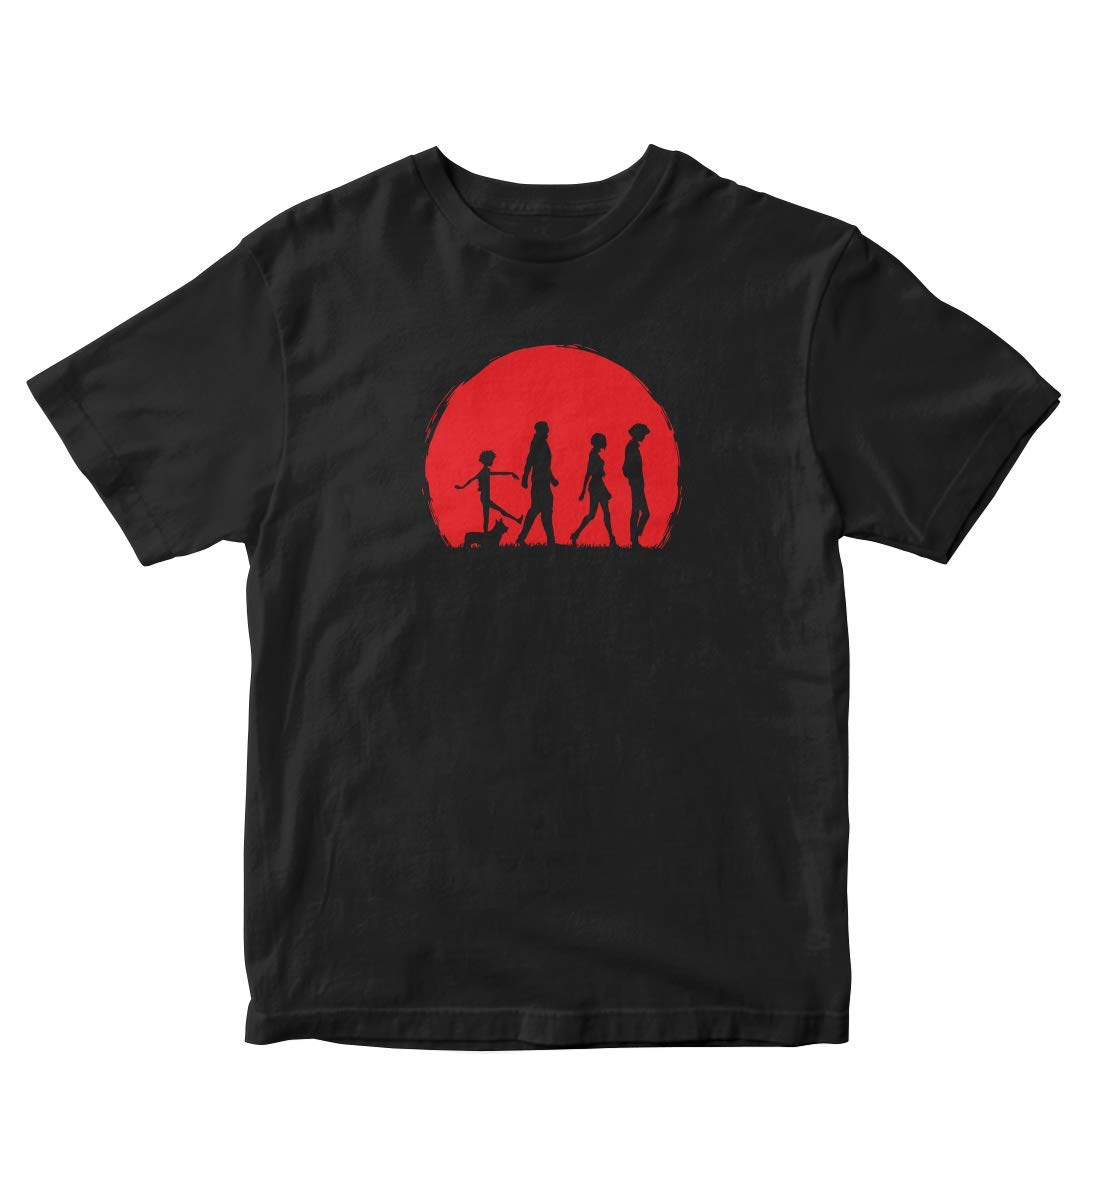 Cowboy Bebop Sunset Anime Manga Black Shirt S A318